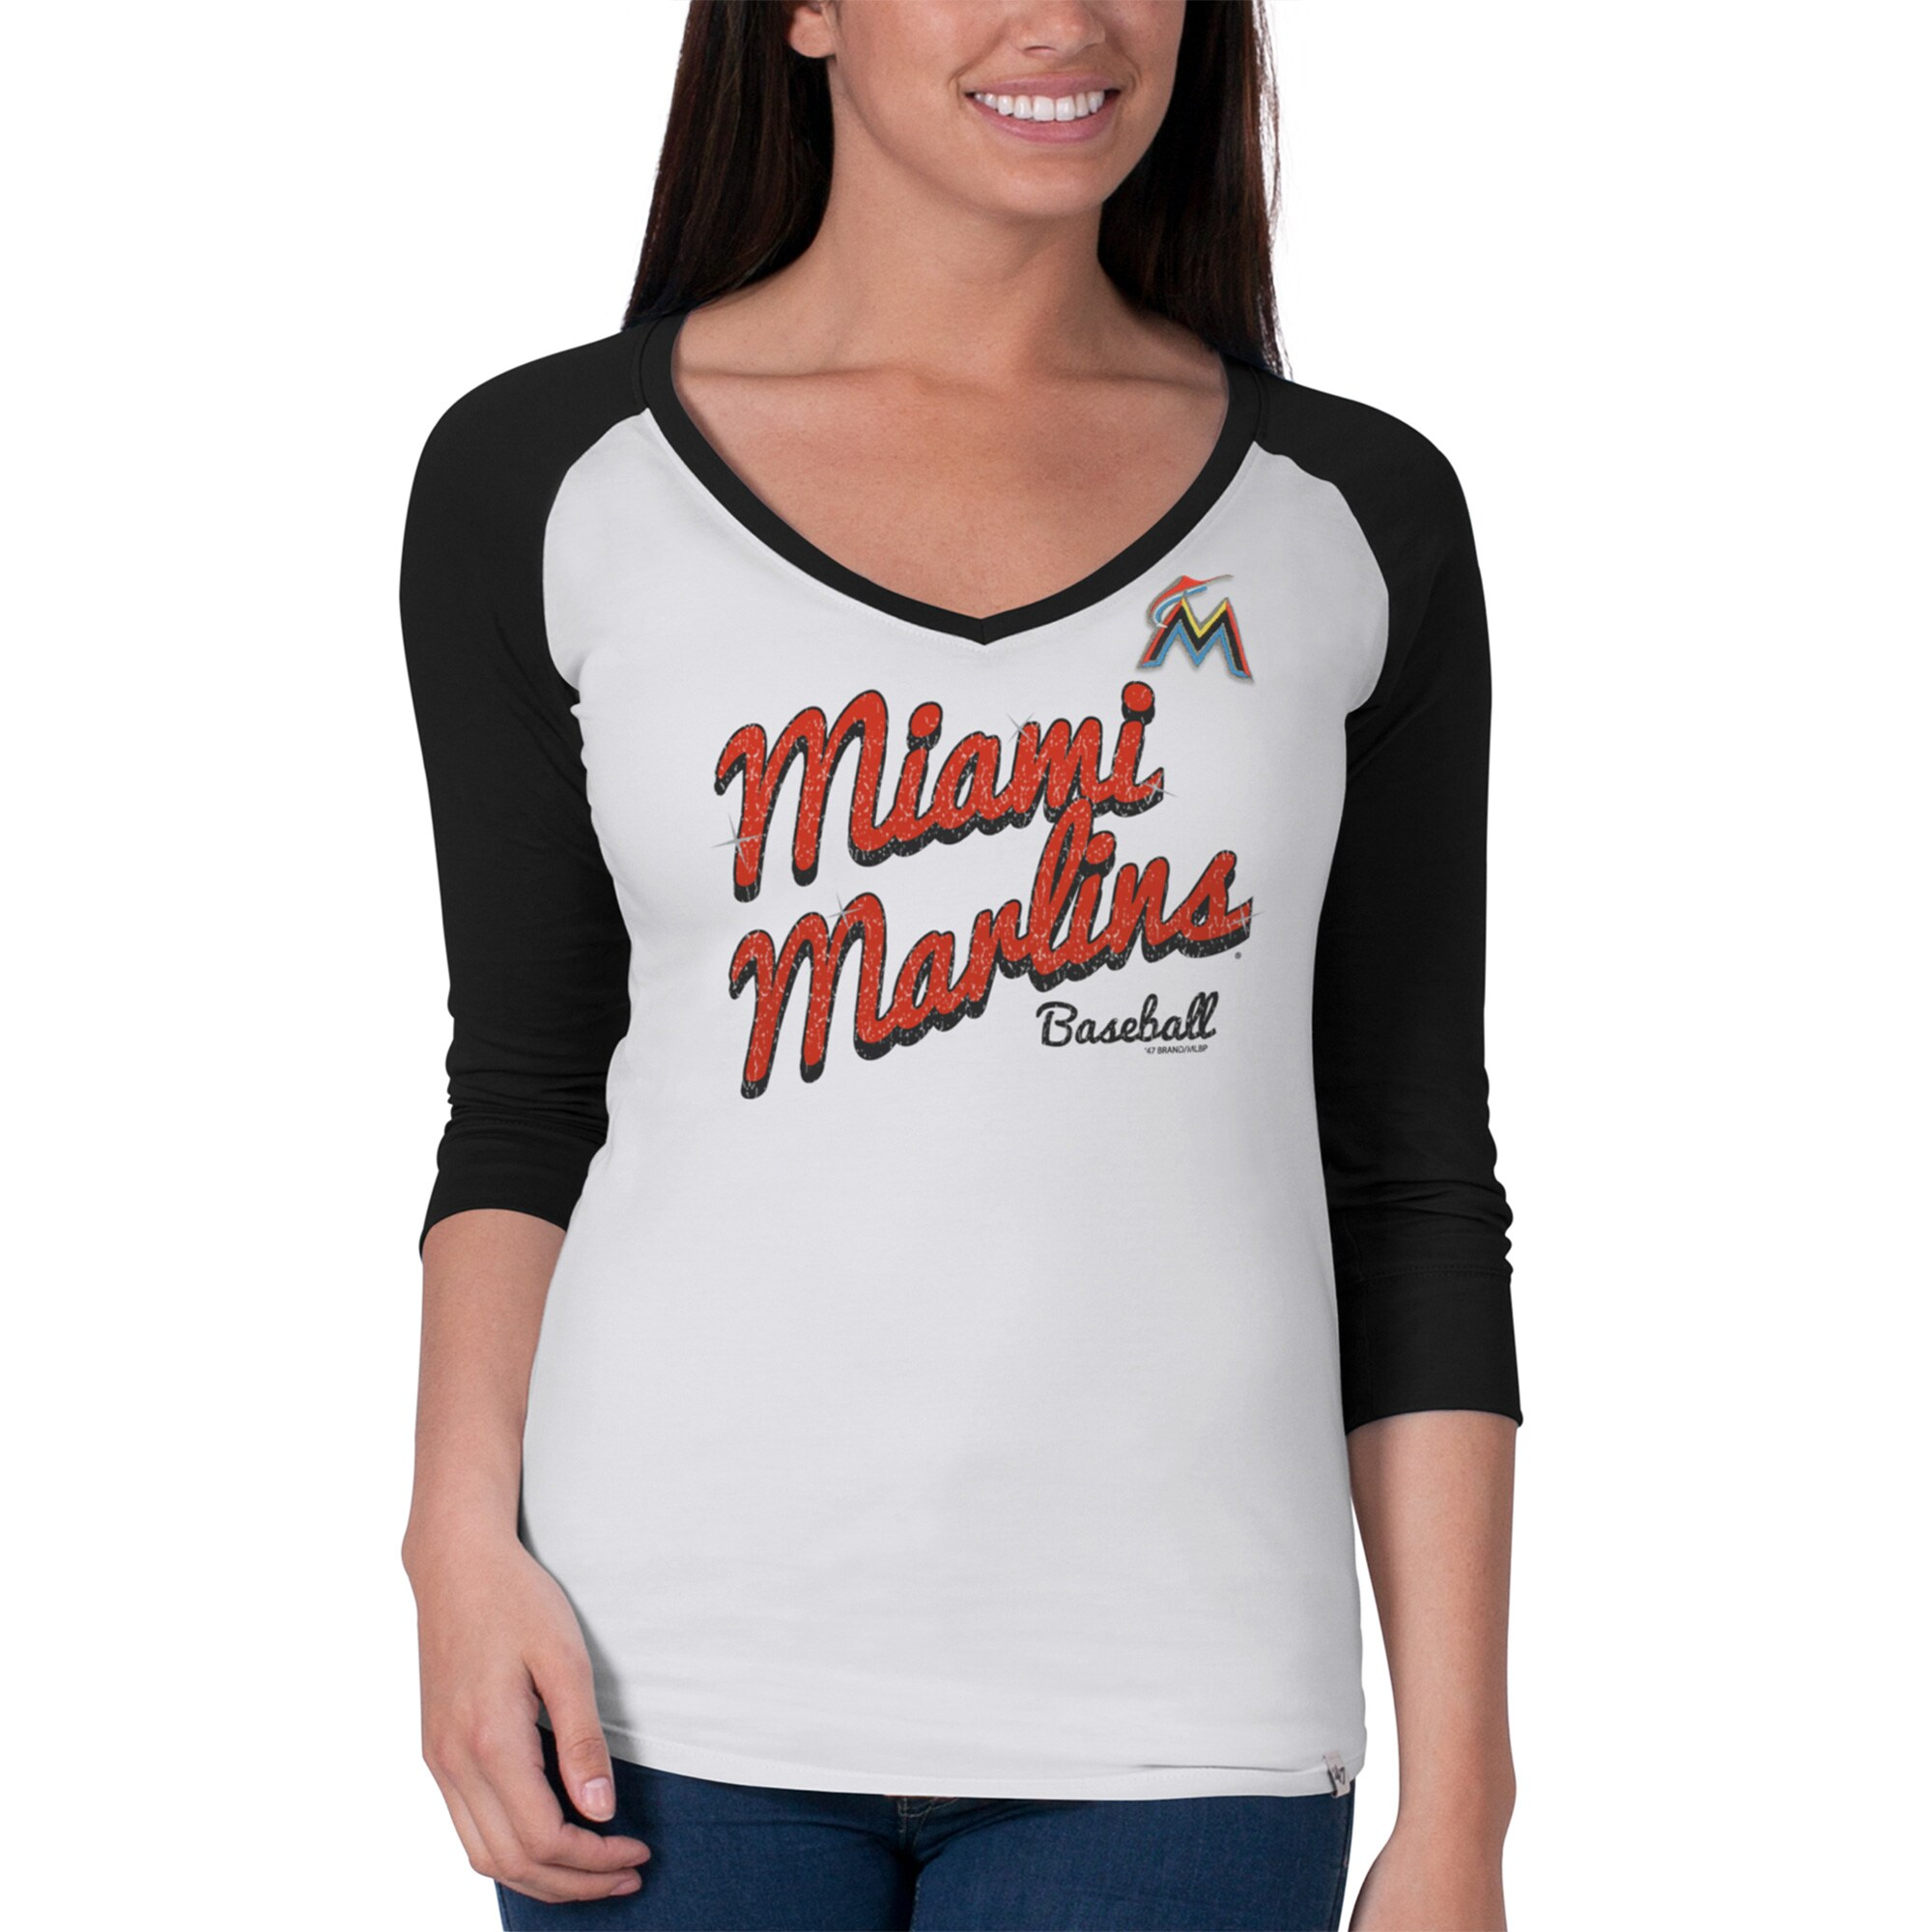 Miami Marlins Women's Batter Up 3/4-Raglan Sleeve T-Shirt - White/Black